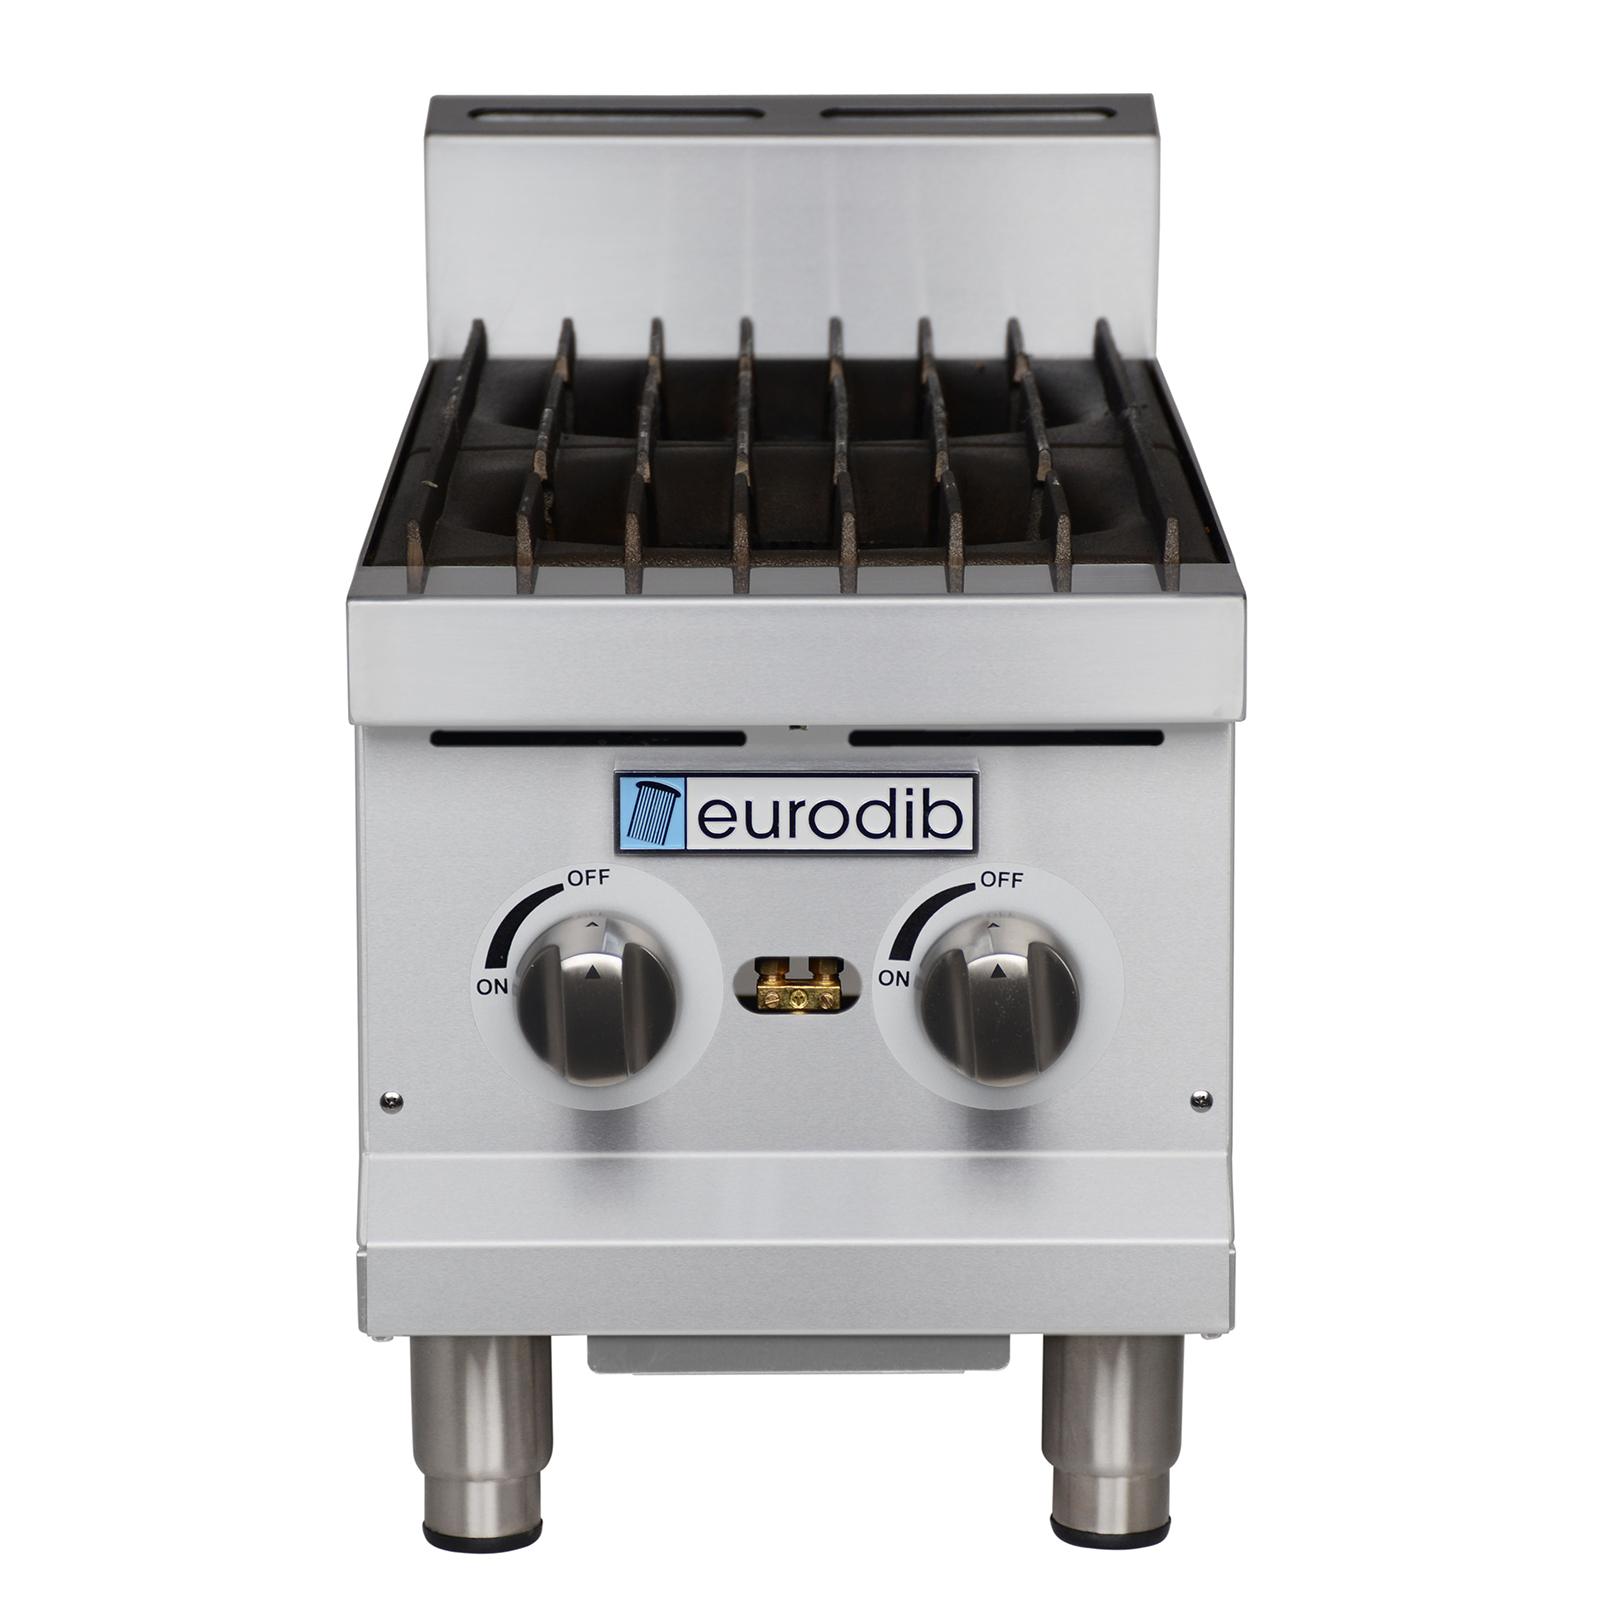 Eurodib USA T-HP212 hotplate, countertop, gas